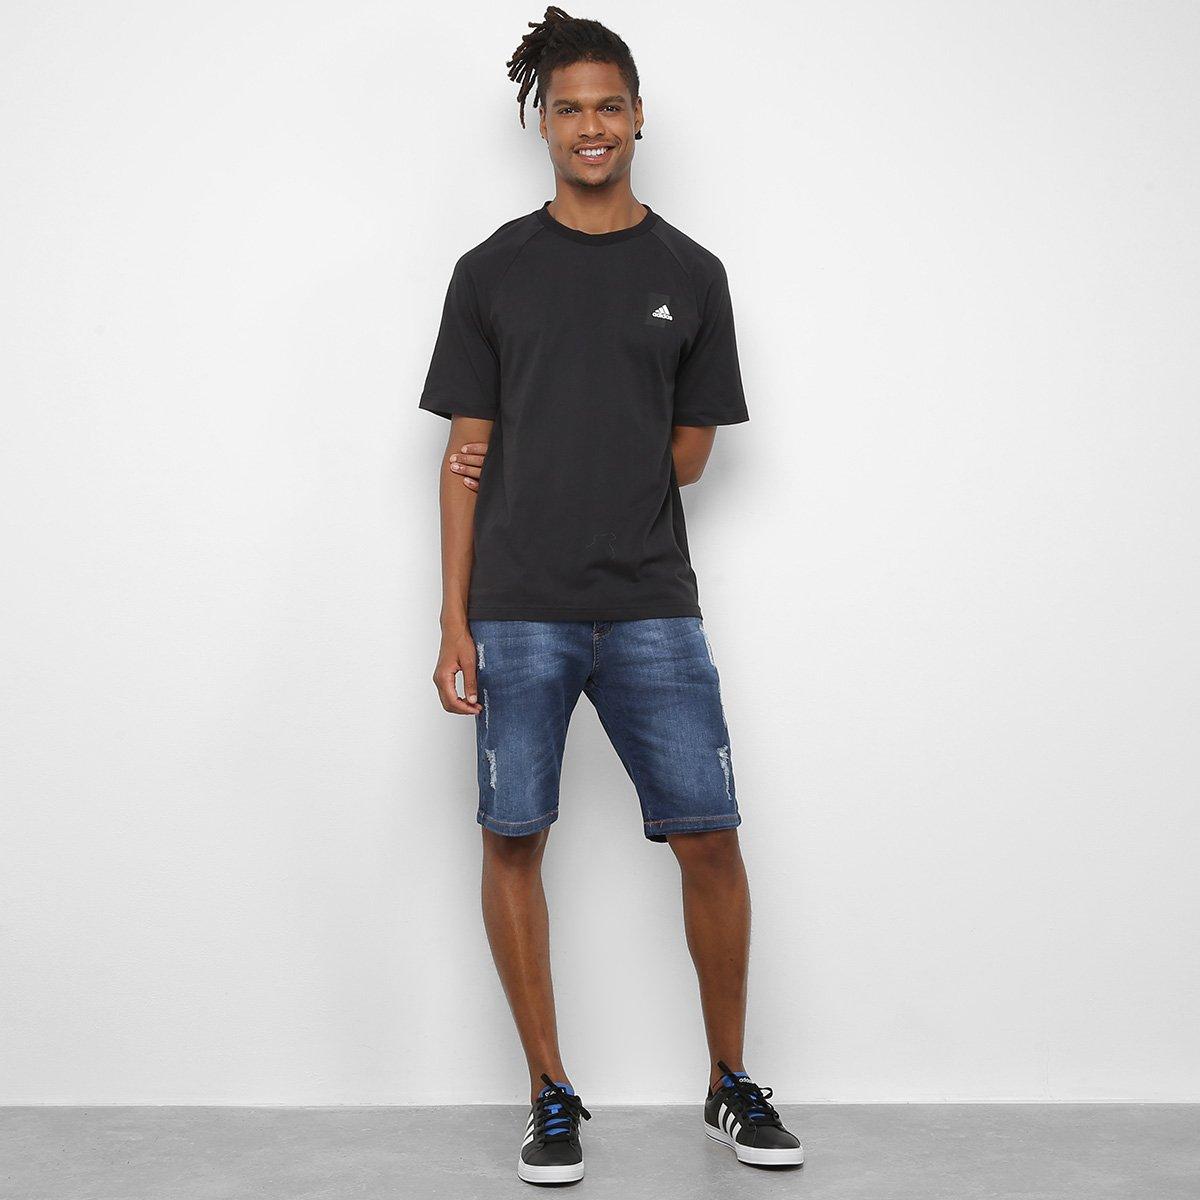 Camiseta Adidas Masculina Mhesta Preta